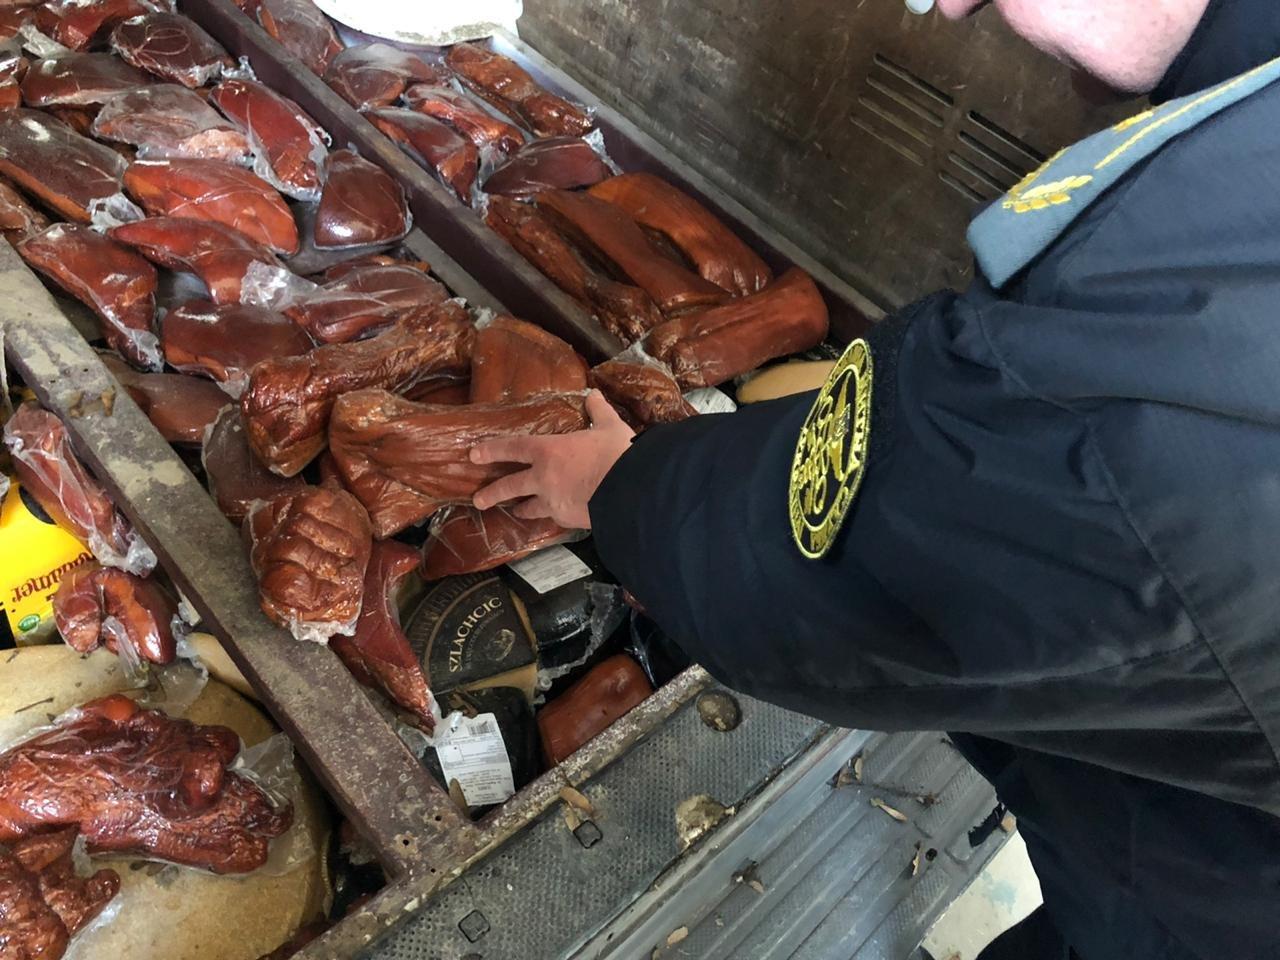 Українець намагався привезти з Польщі майже 1,5 тонни м'яса, сала та сиру (фото), фото-2